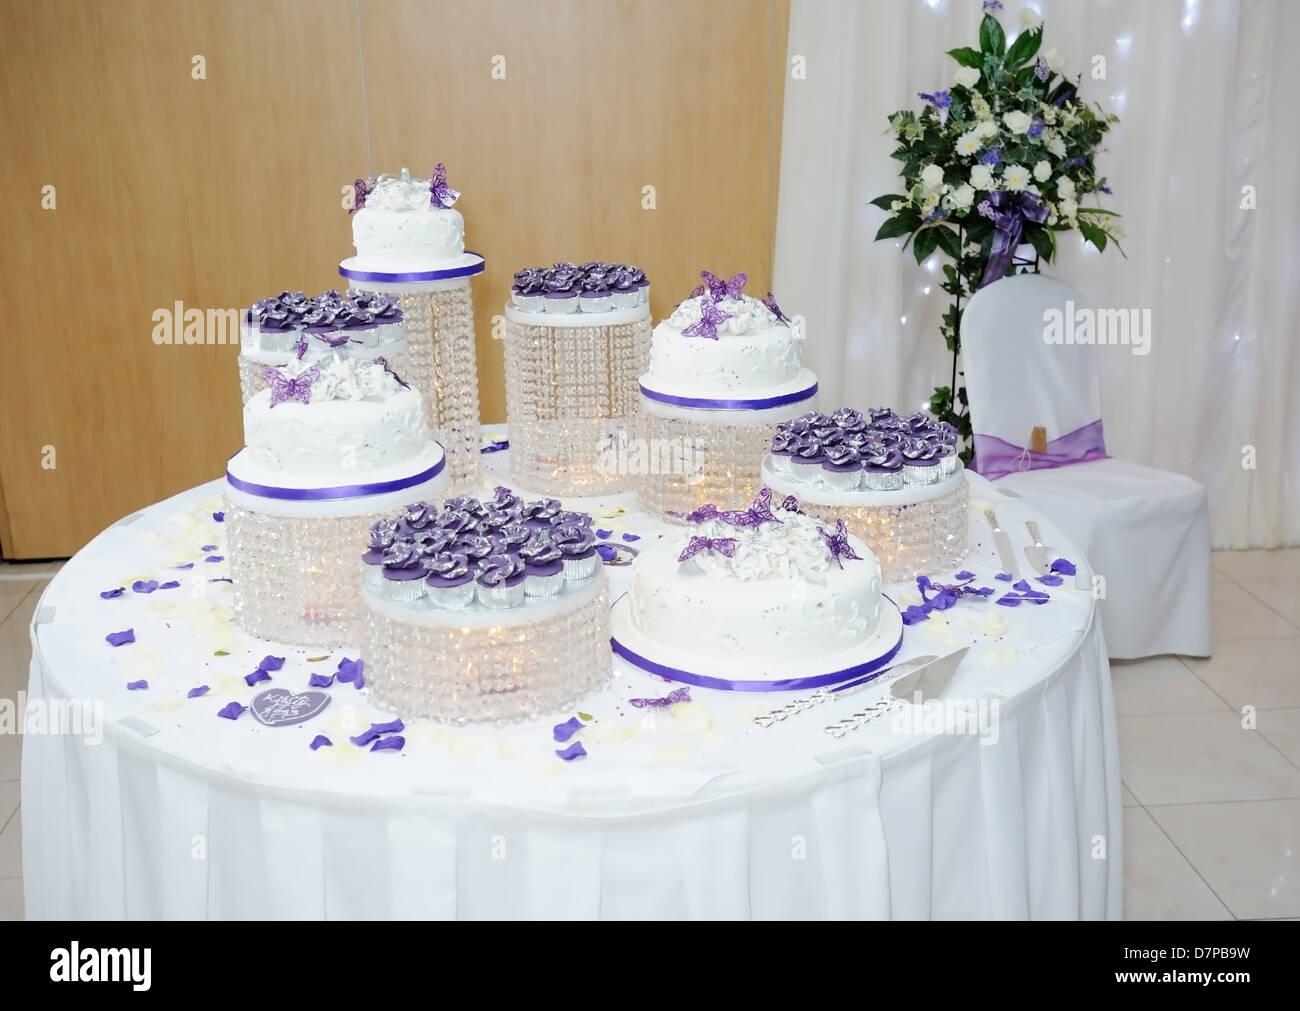 Big white and purple asian wedding cake at reception Stock Photo ...